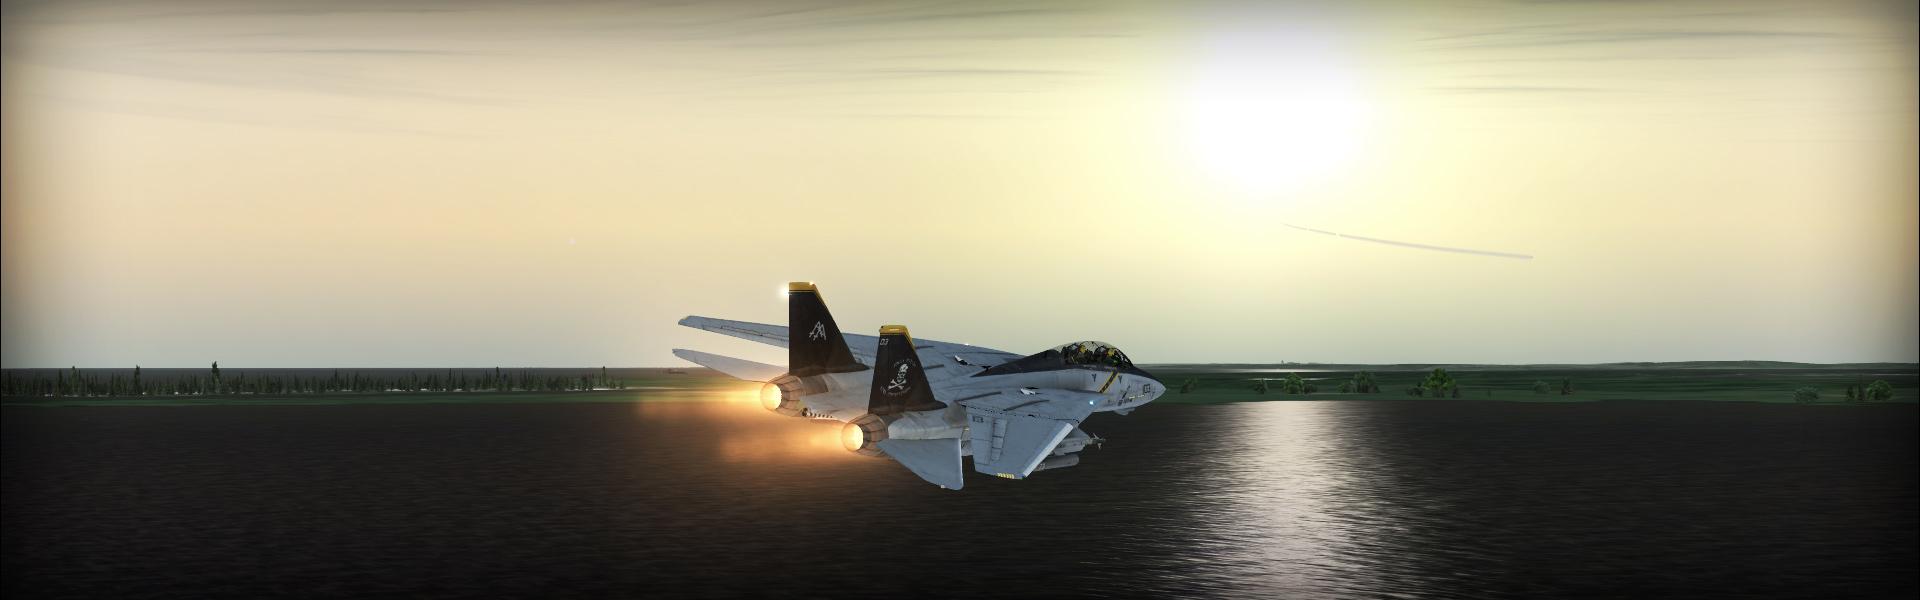 Aerosoft F-14 X – review (6*) - summary • C-Aviation